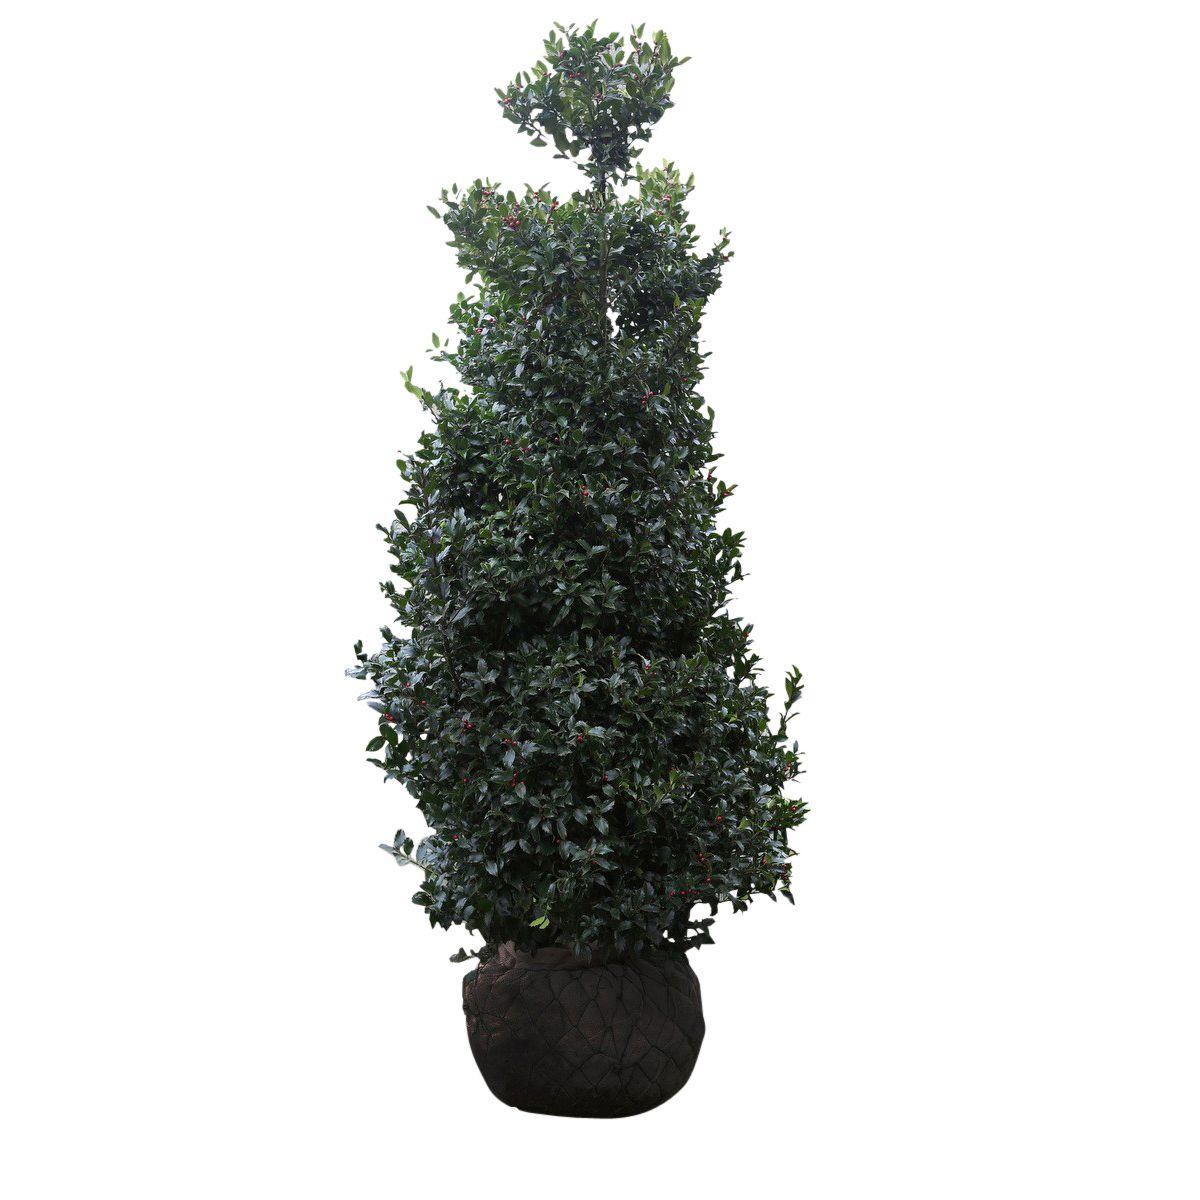 Stechpalme 'Heckenfee' Wurzelballen 150-175 cm